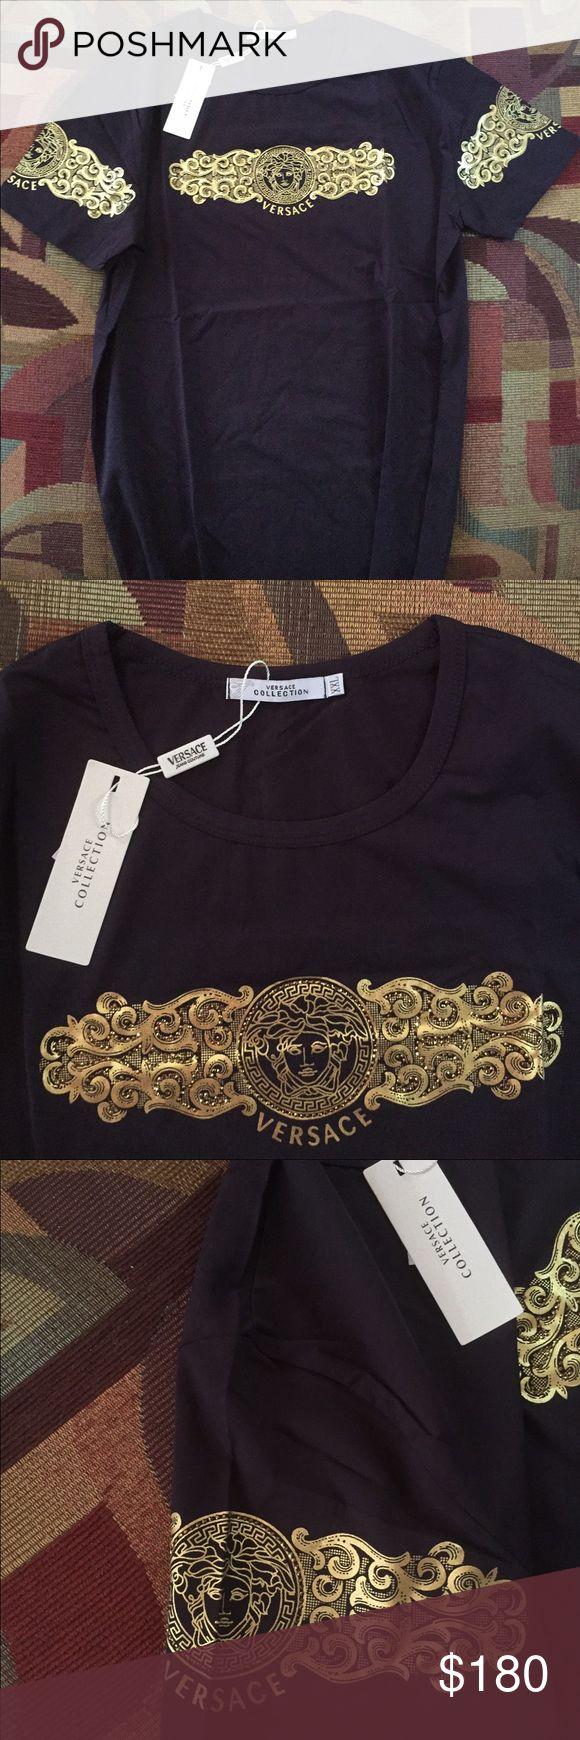 Men's Versace shirt Black and gold men's Versace shirt 😍 price reflects authenticity Versace Shirts Tees - Short Sleeve